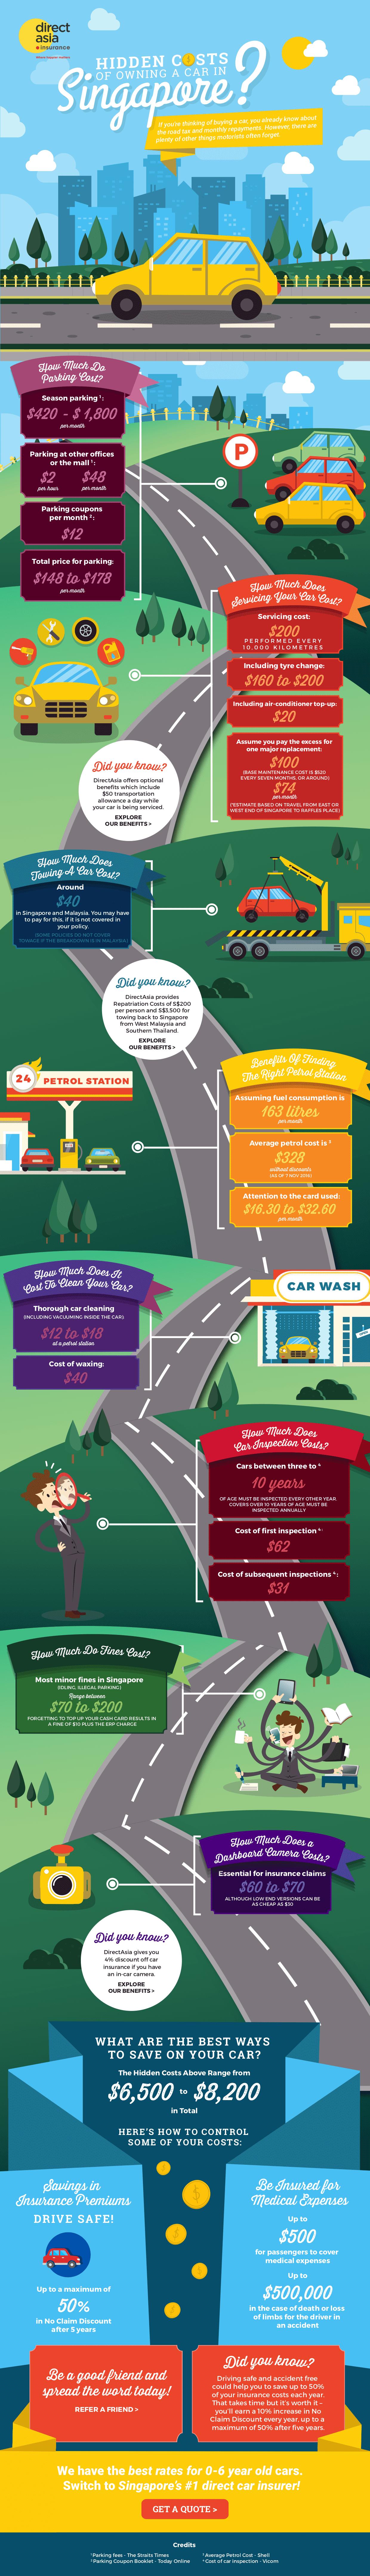 DirectAsia infographic